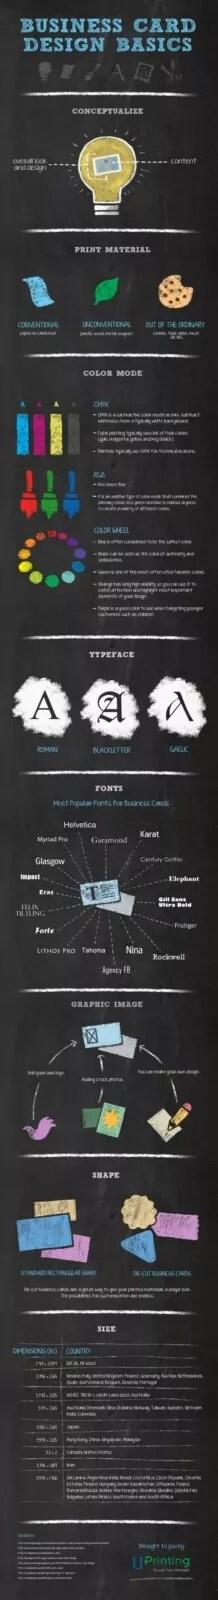 Business Card Design Basics Infographic Revised e1378279760643 - Business Card Design Basics [Infographic]